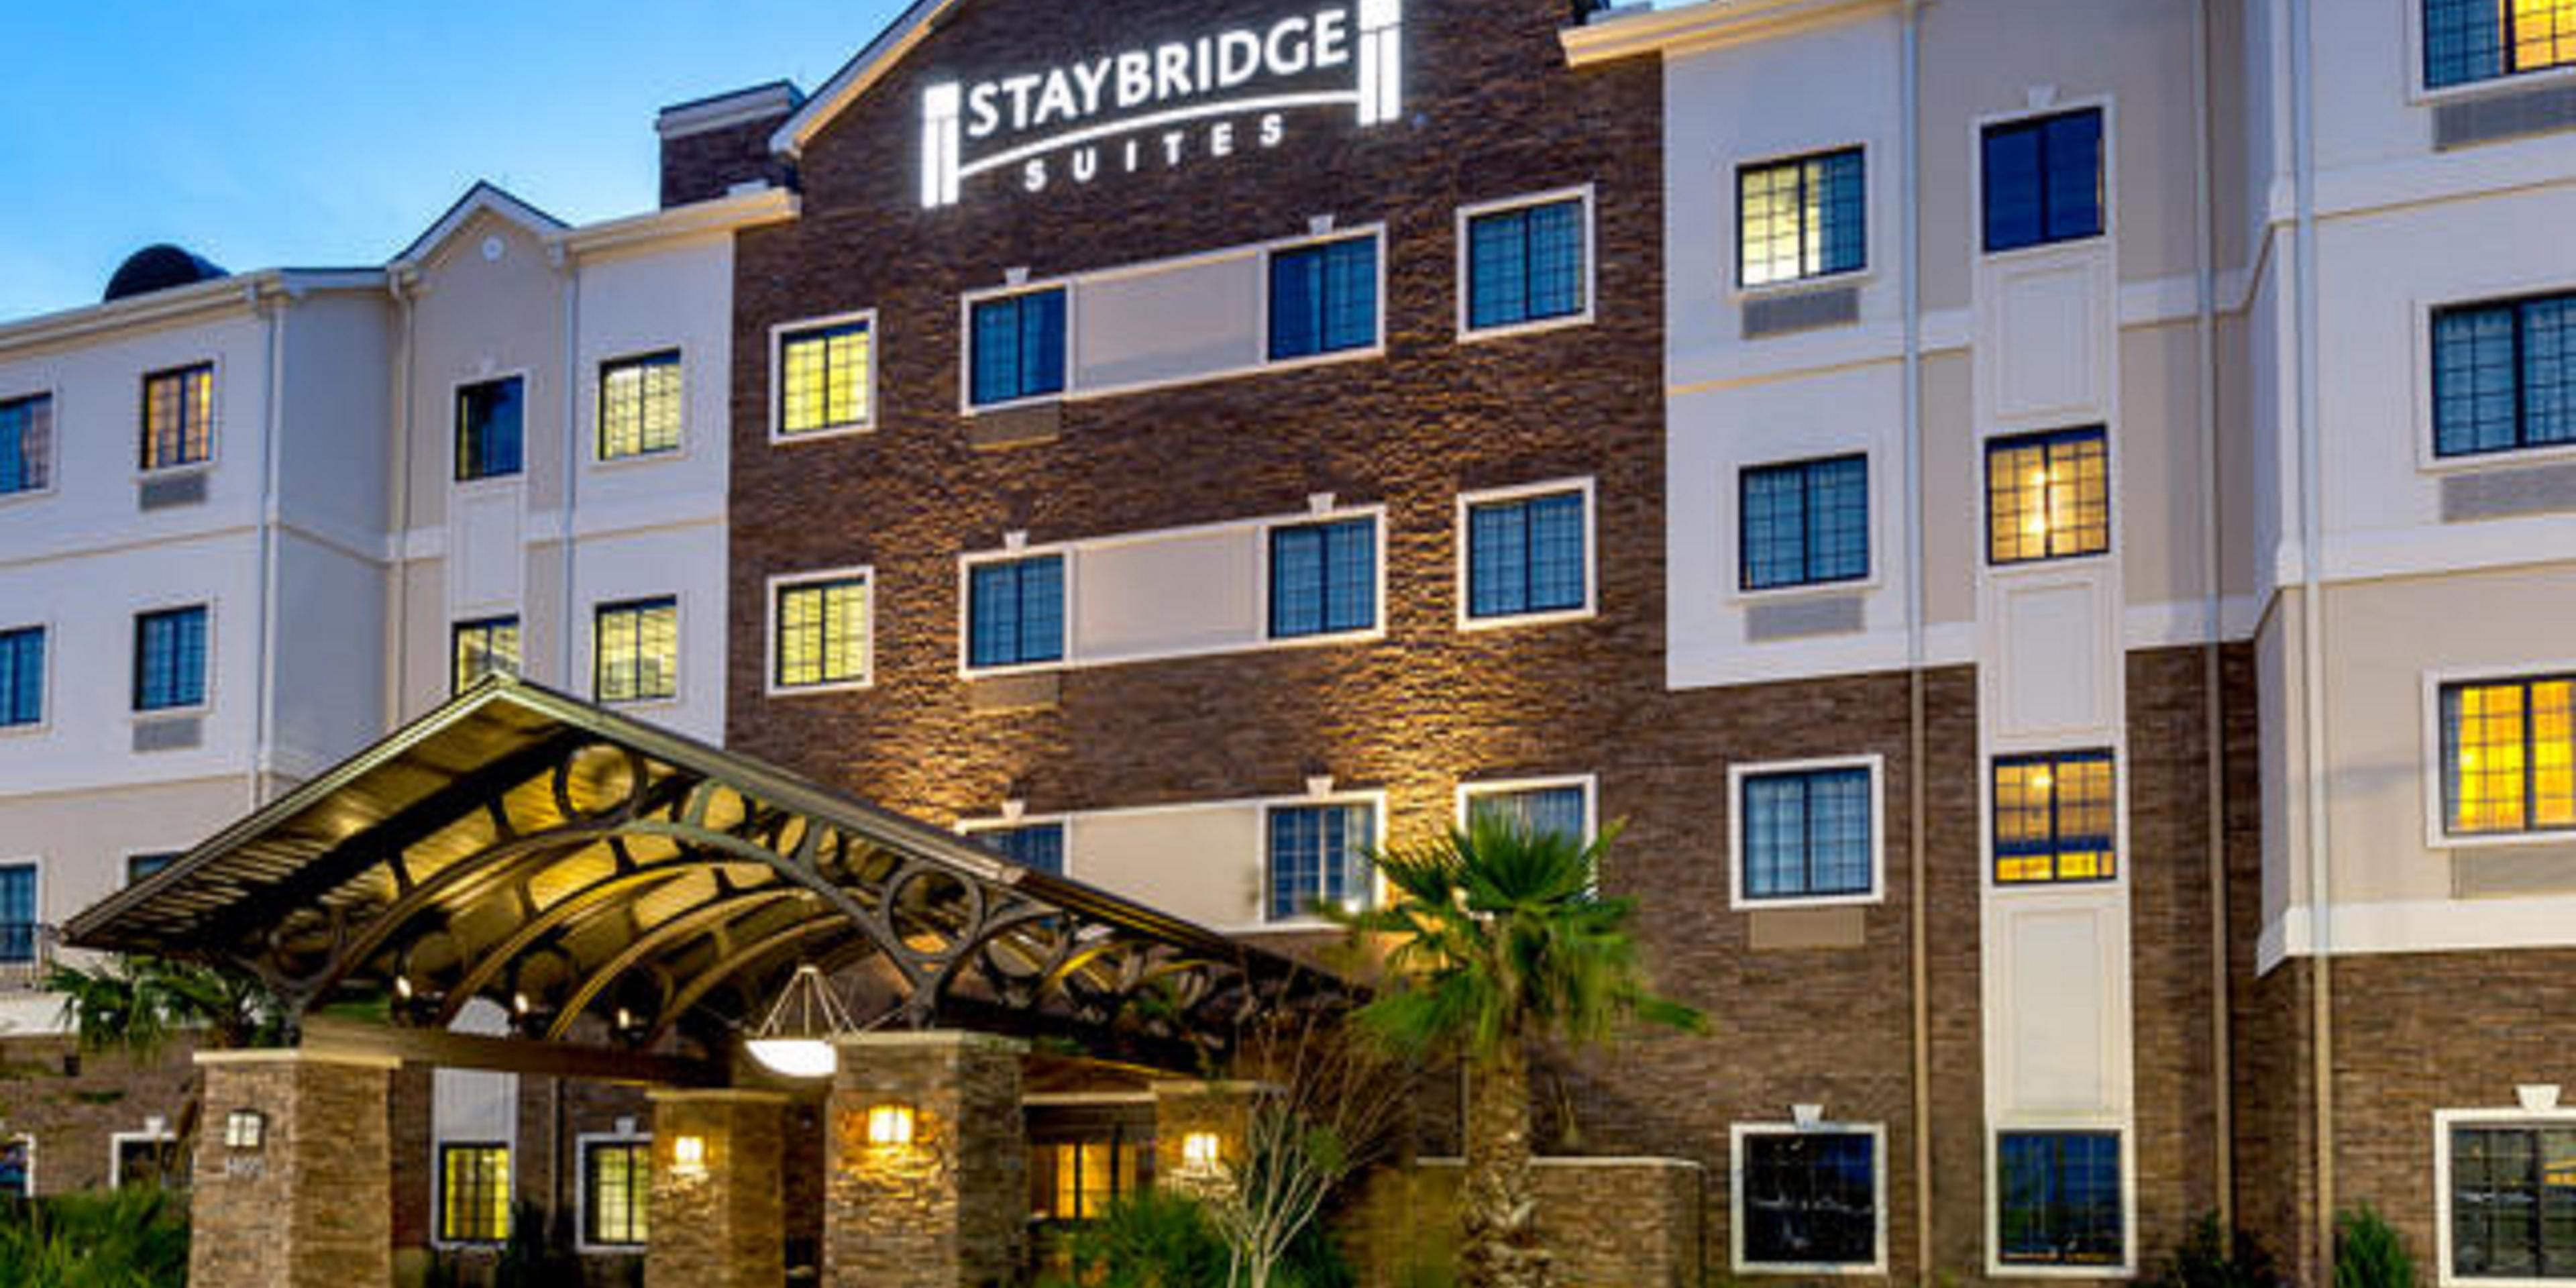 Staybridge Suites College Station image 0